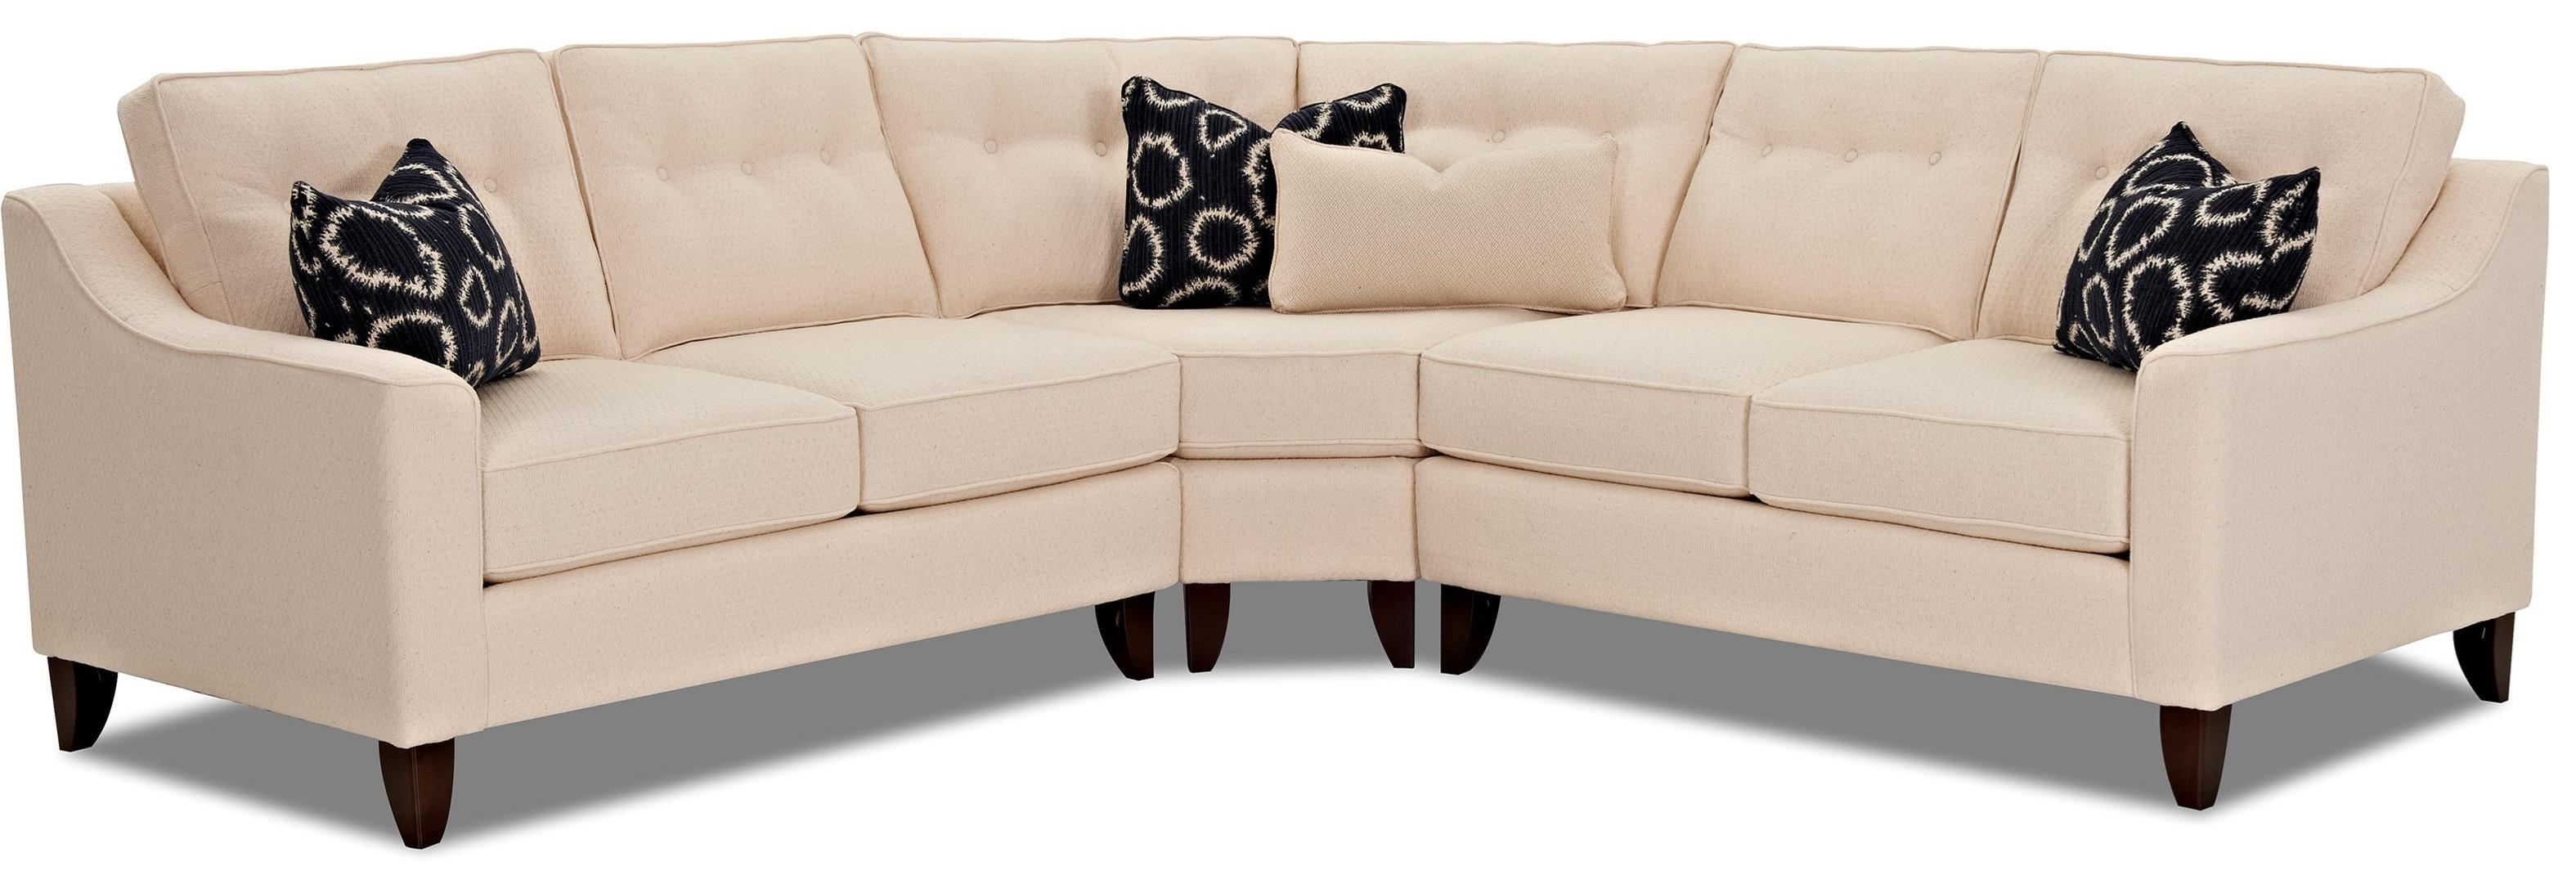 wedge table for sectional sofa crypton sofas canada palmyra modular reclining w